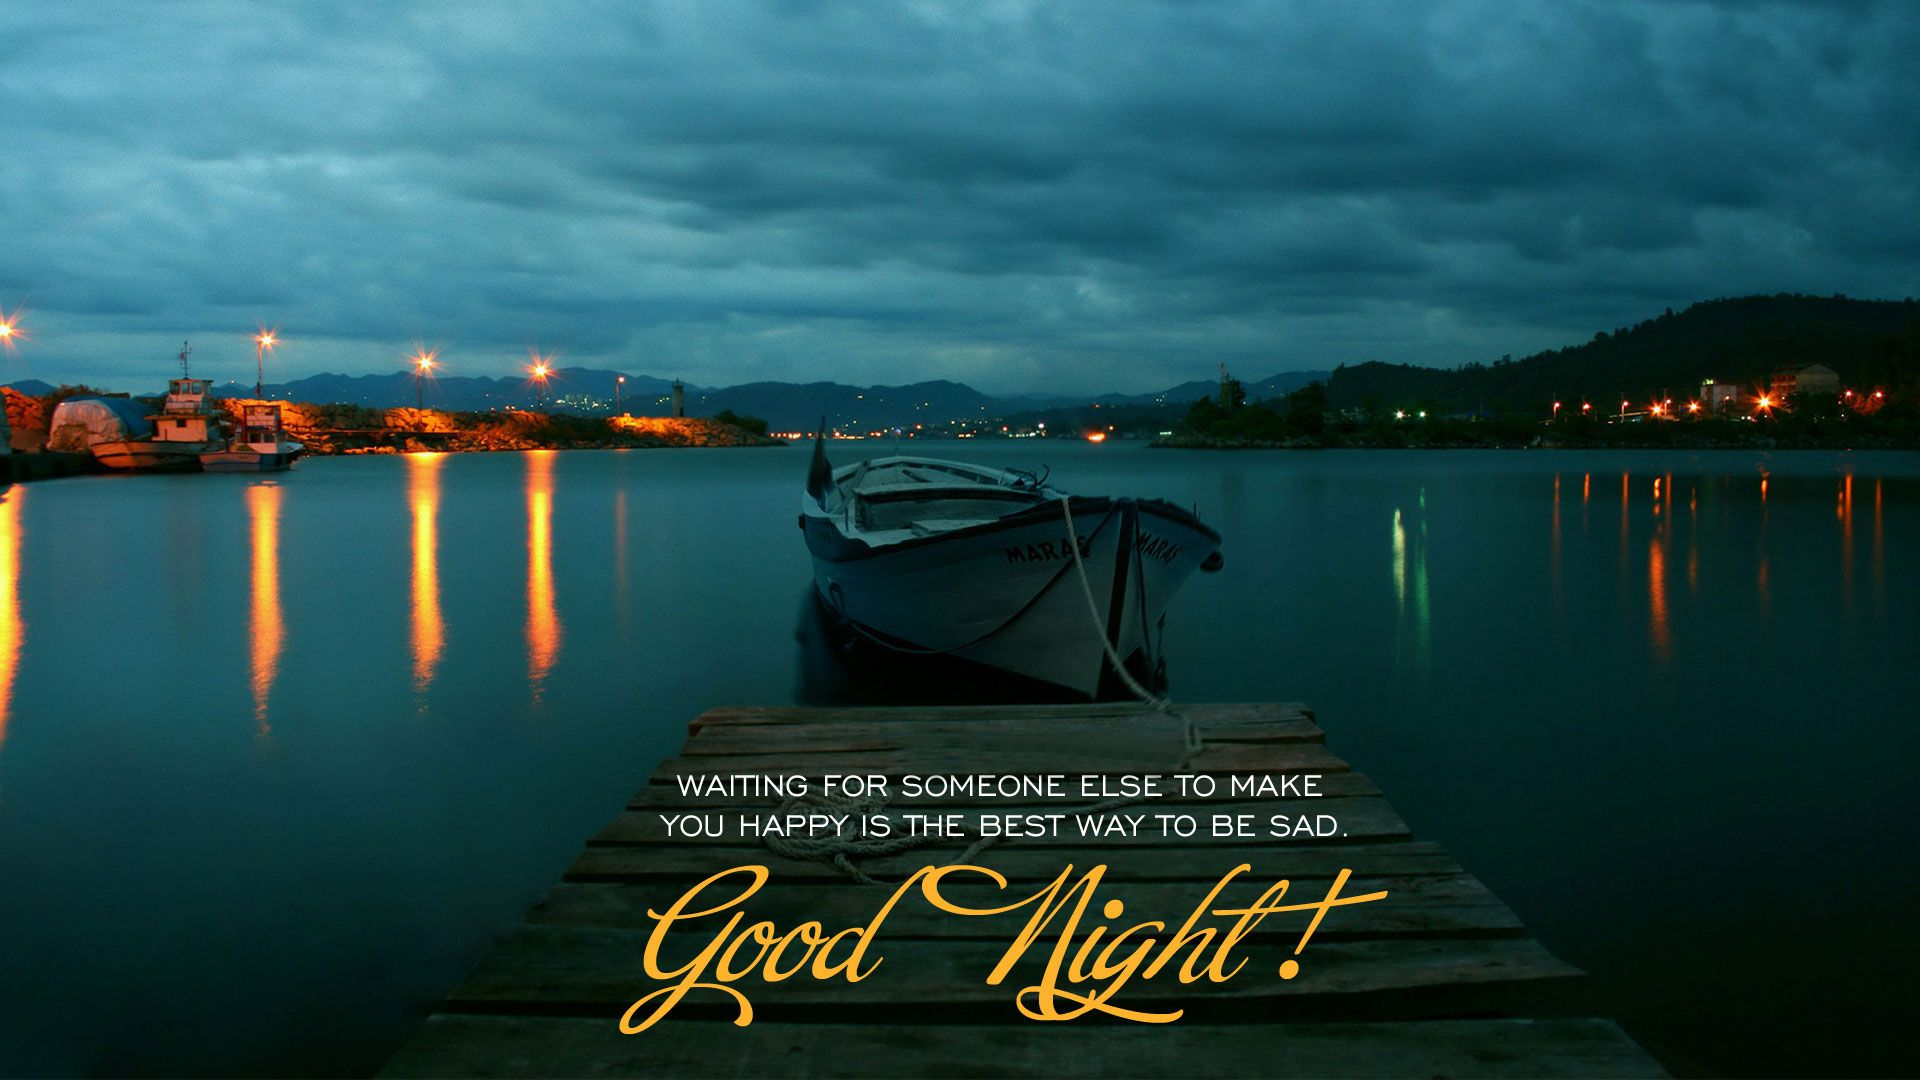 hd pics photos stunning attractive sweet dreams 11 hd desktop background wallpaper